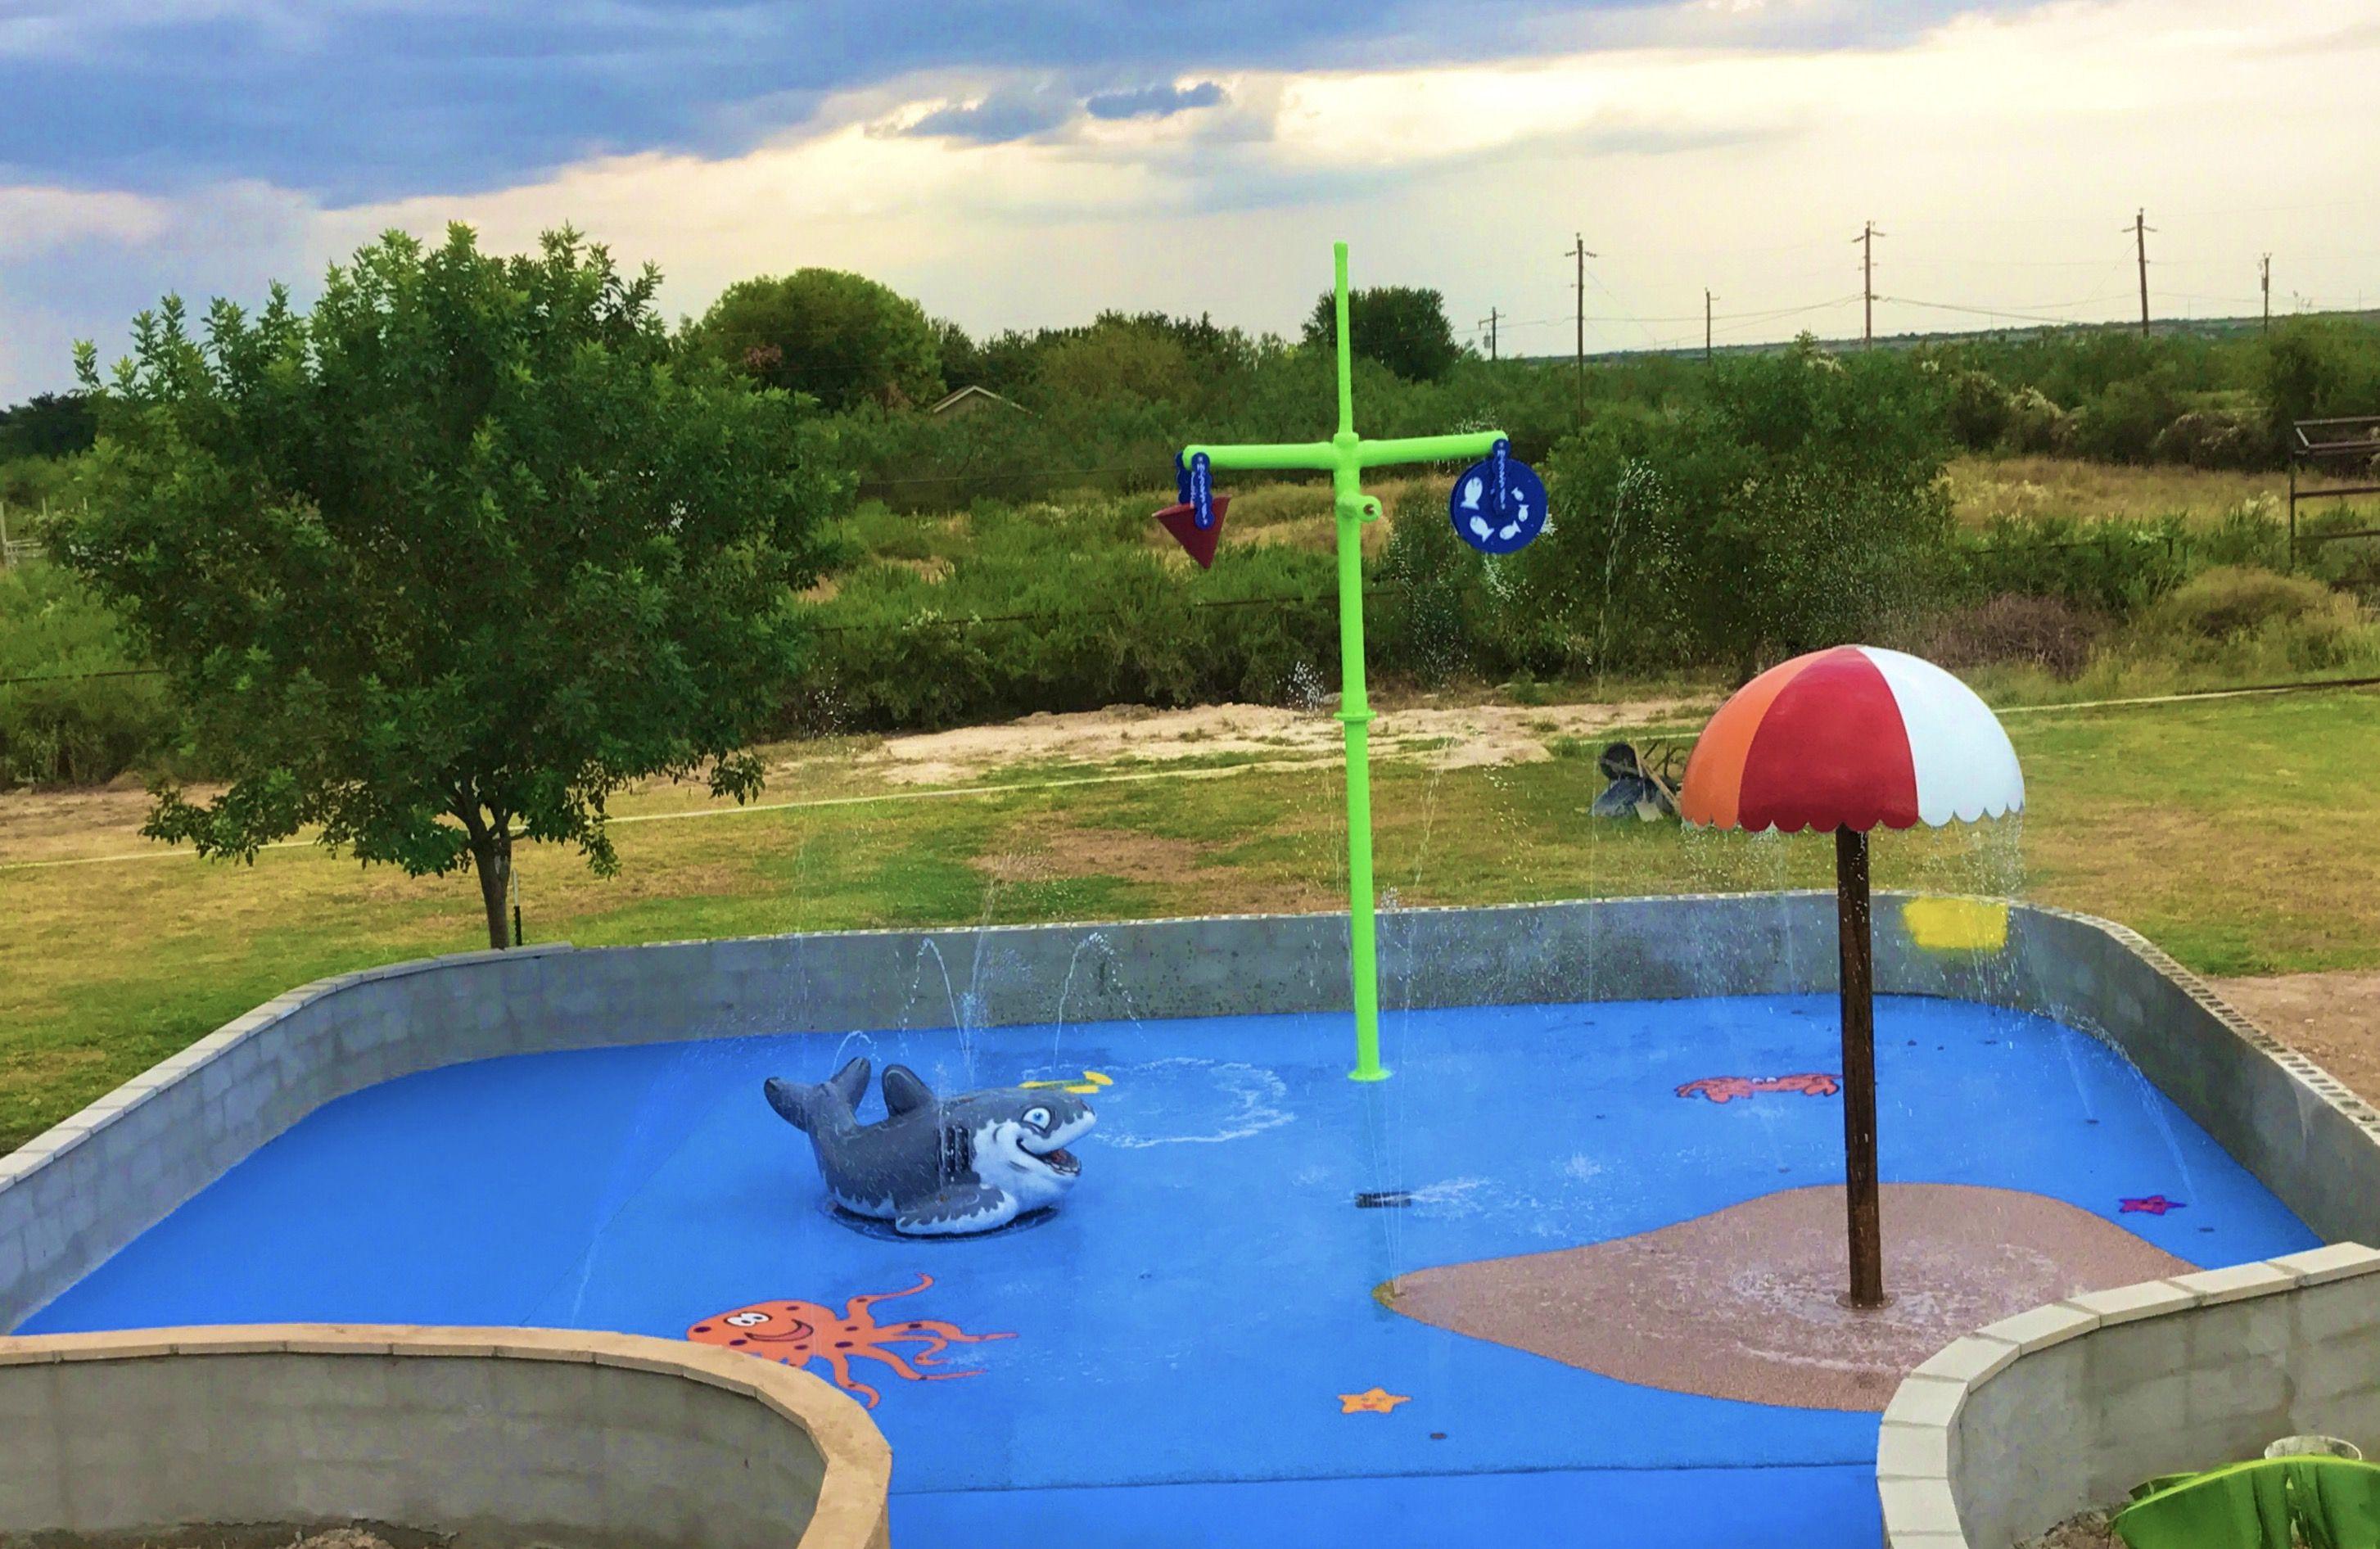 We Installed This Unique Splashpad In Del Rio Tx We Manufactured The Beach Umbrella Double Fun Water Wheel A Backyard Splash Pad Splash Pad Backyard Design